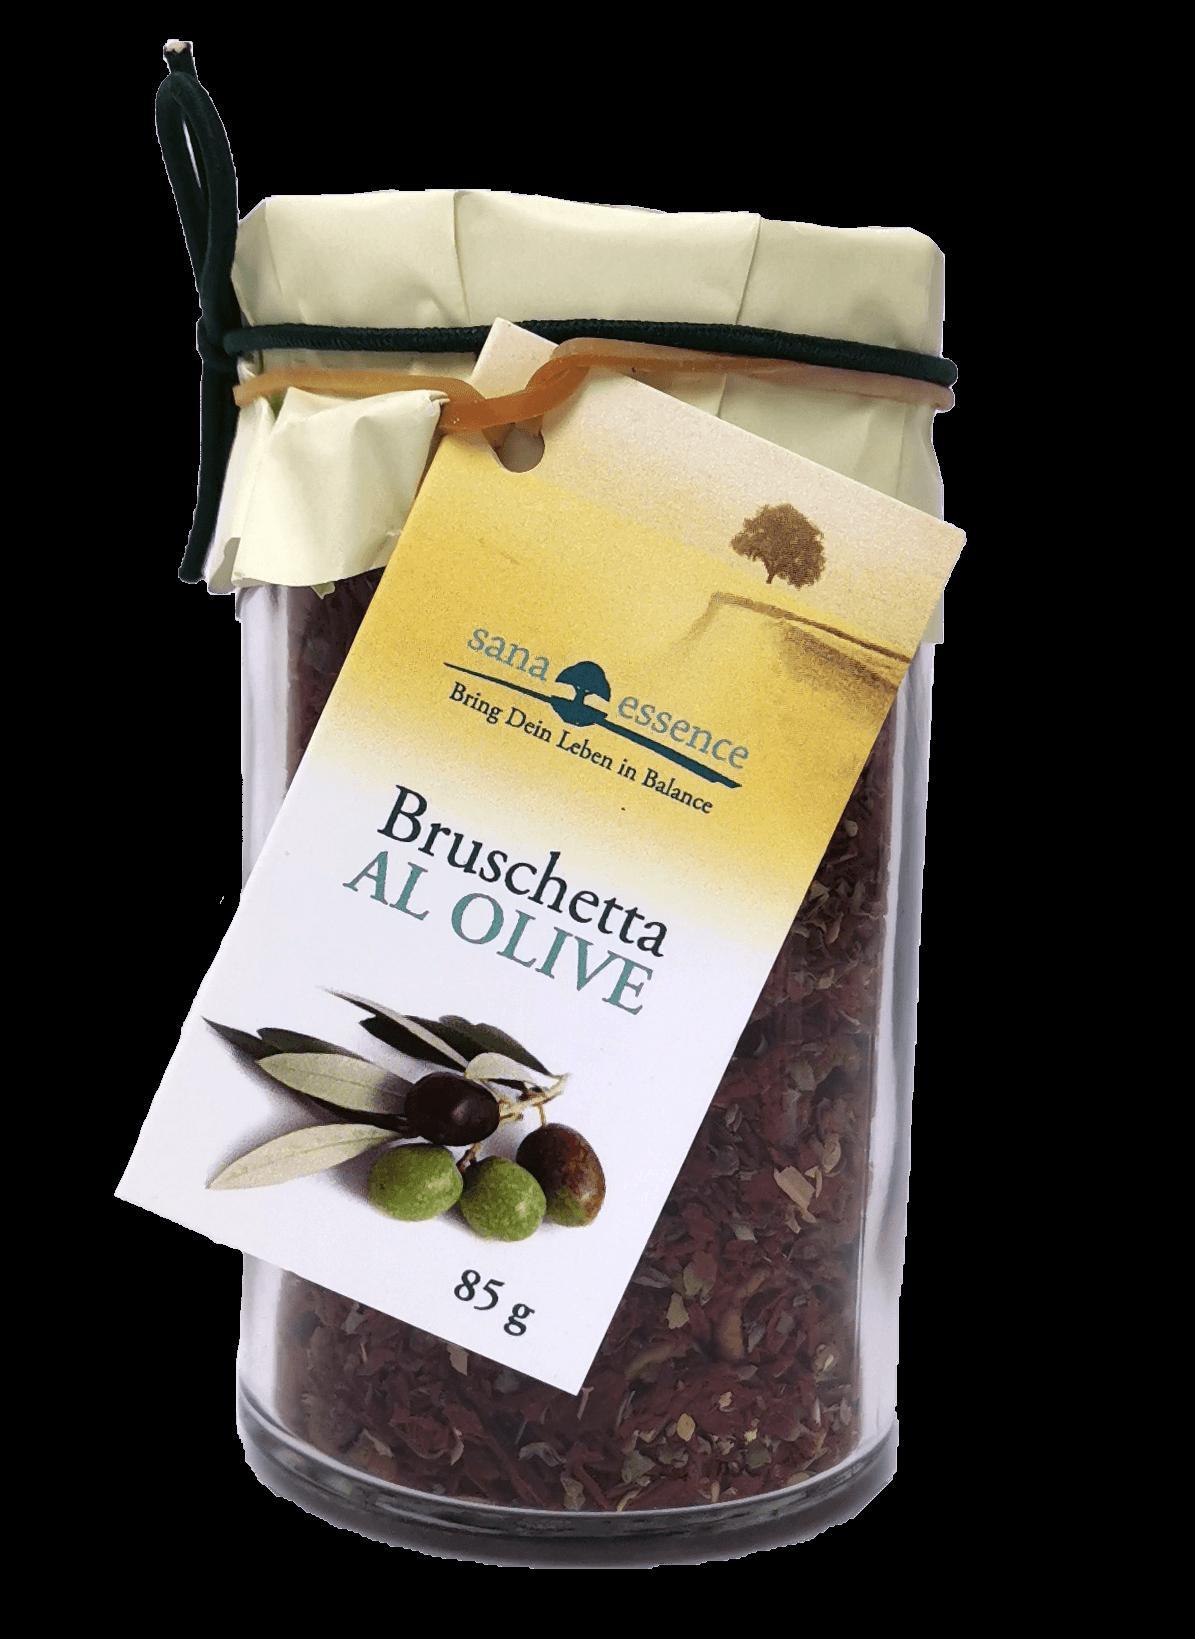 Bruschetta Al Olive